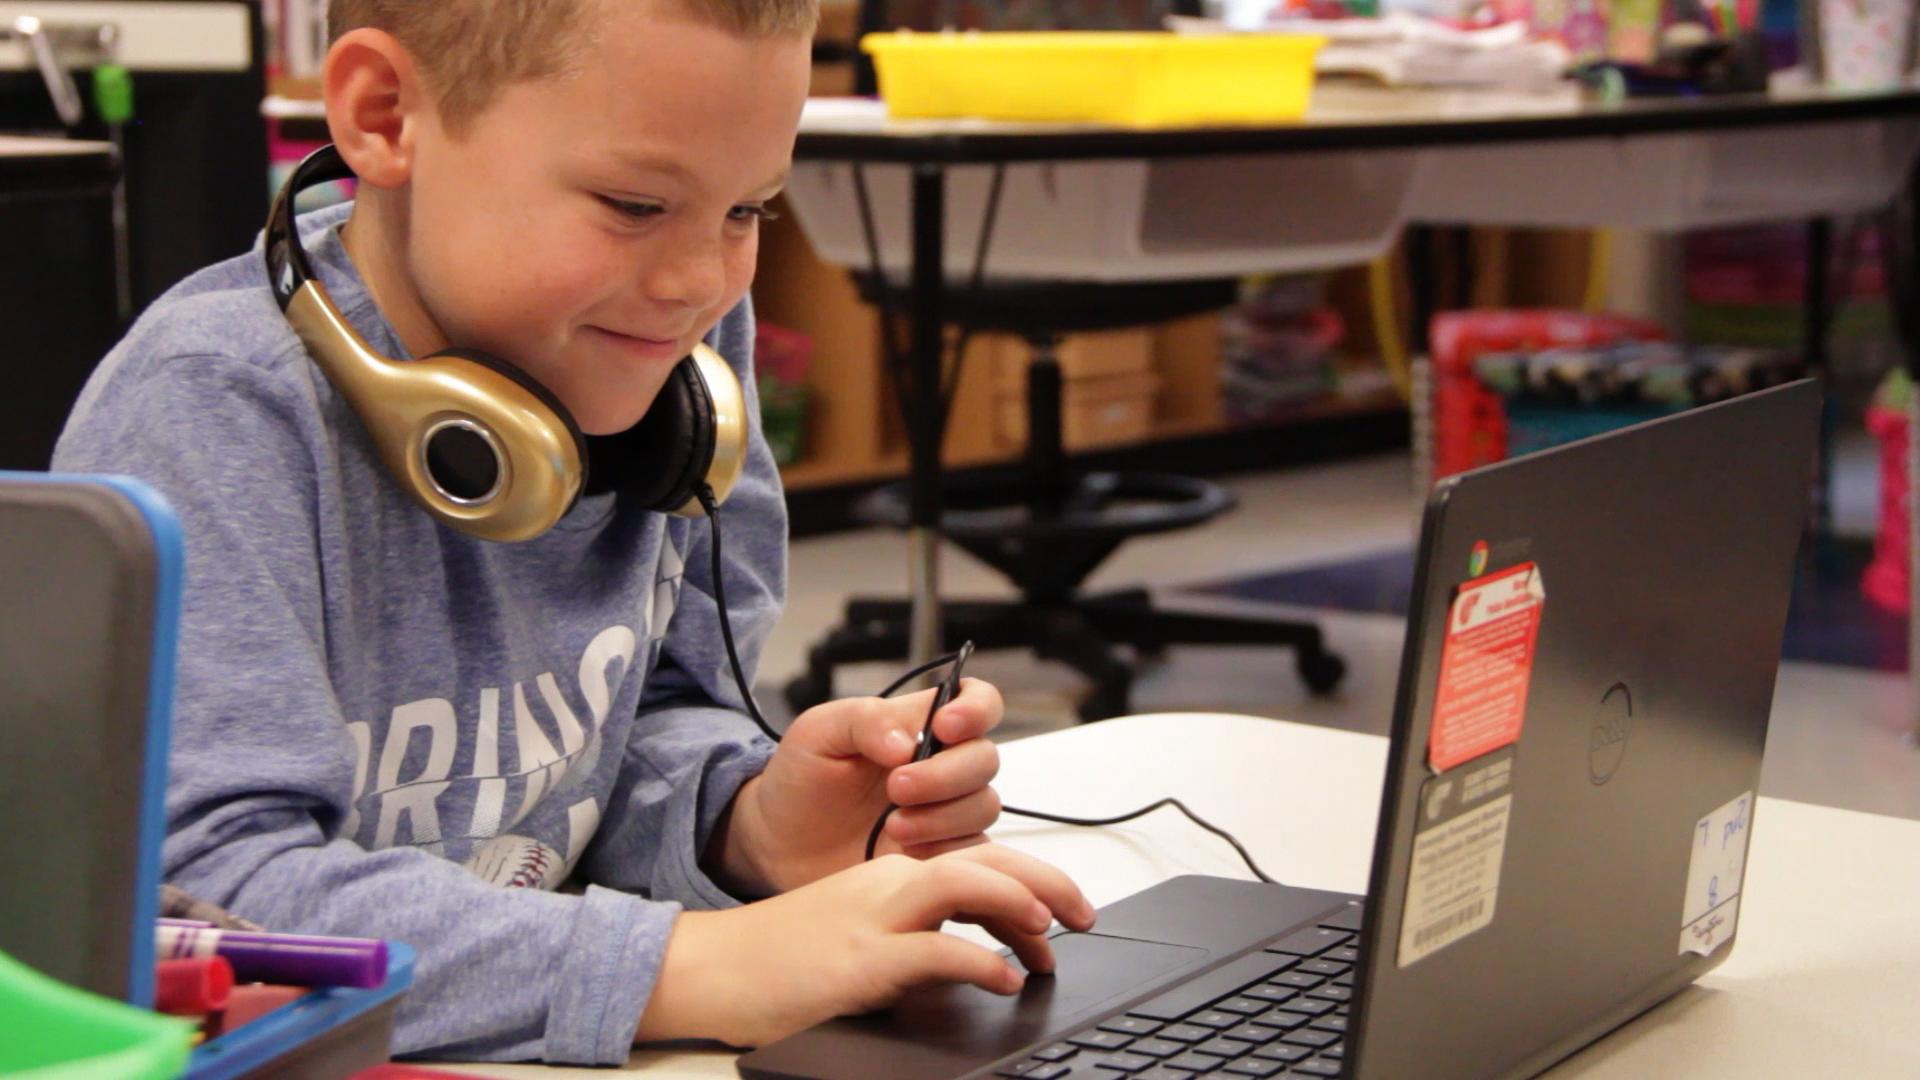 boy-smiling-laptop-brazosport-st-math